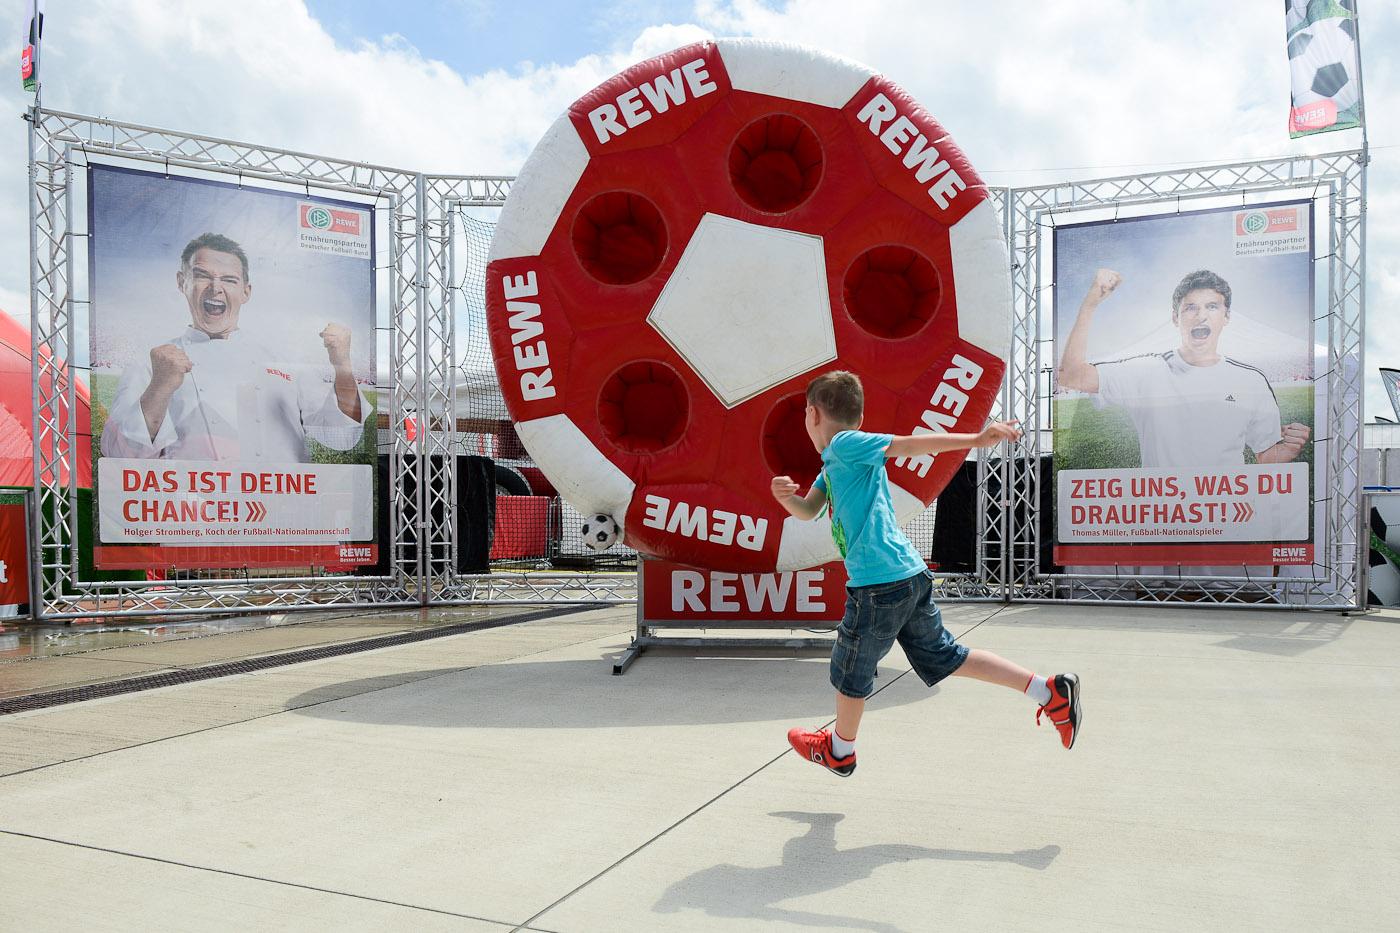 Rewe Family Fussballwelt